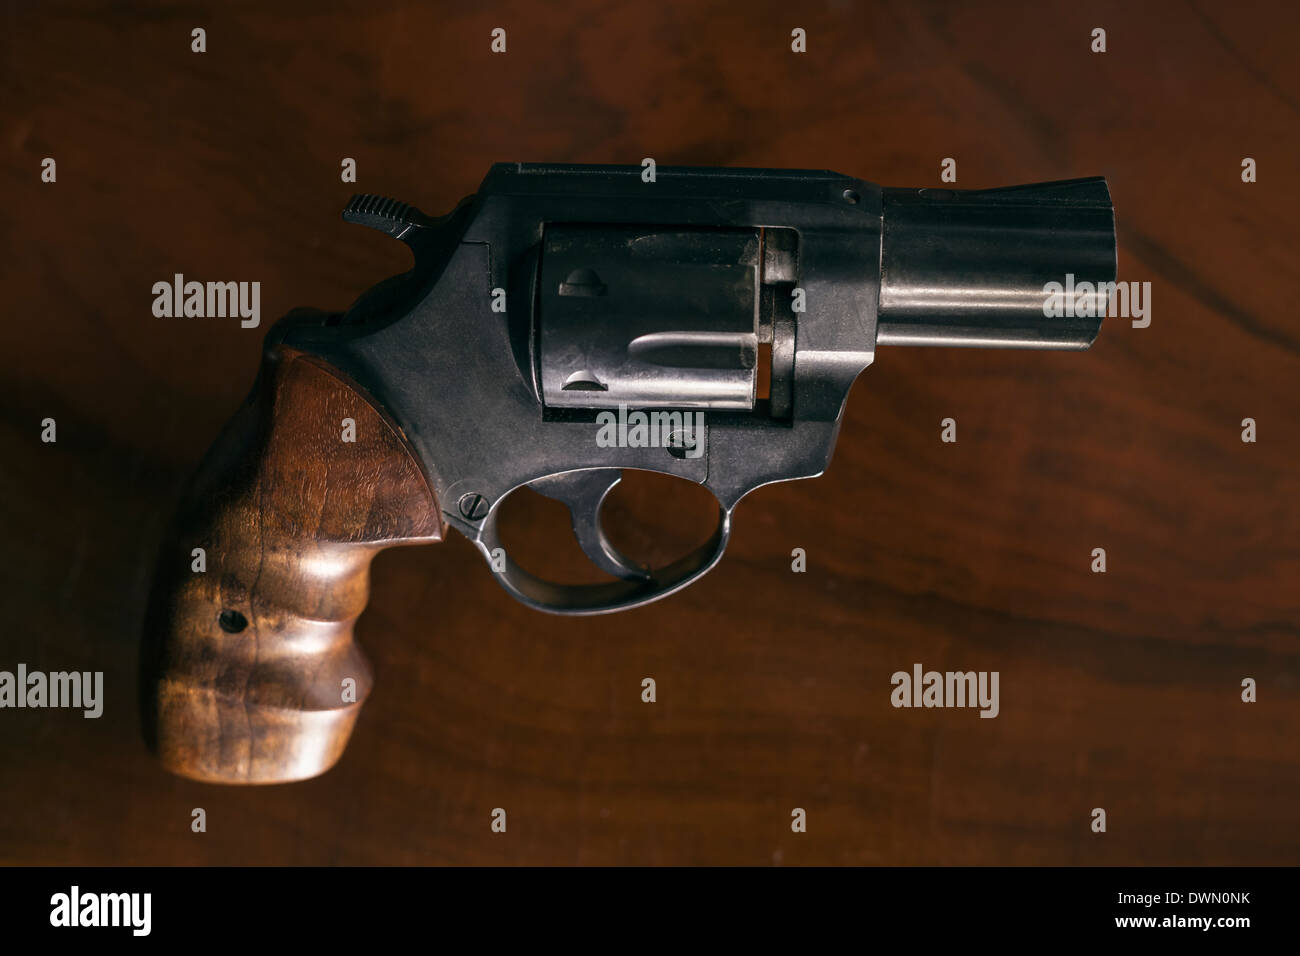 Revolver handgun over wooden background. - Stock Image